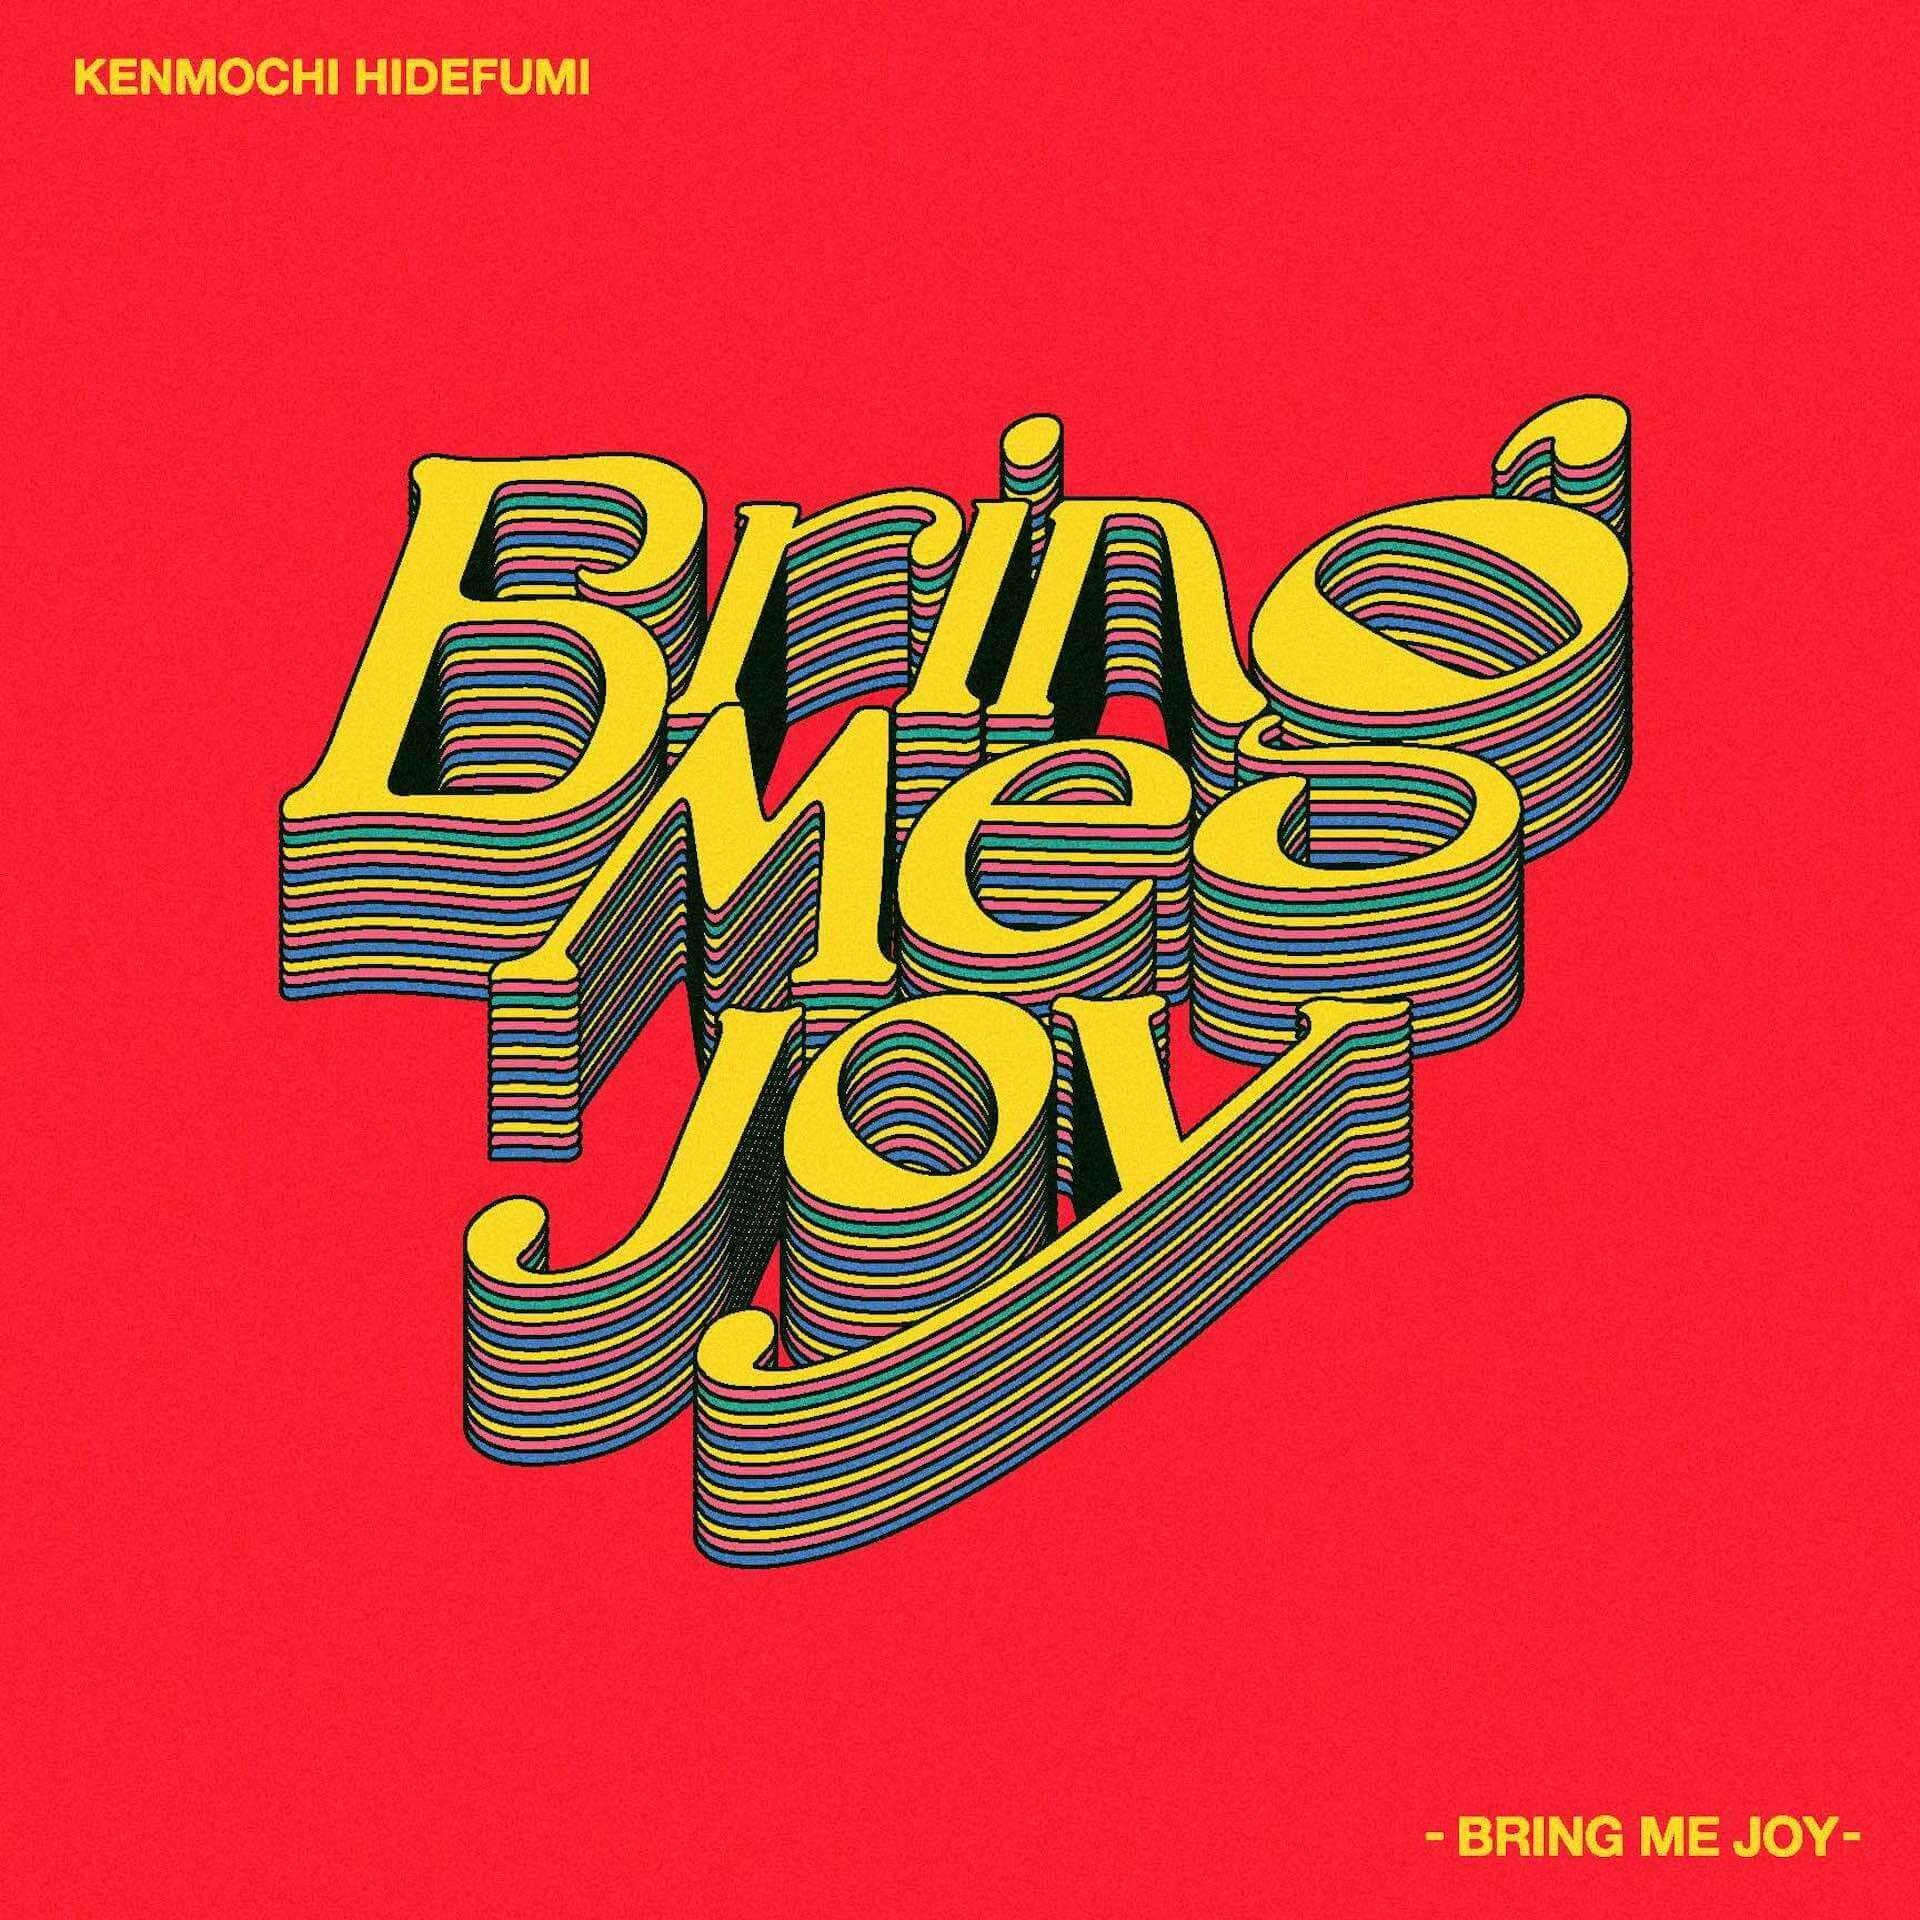 Kenmochi Hidefumiの新曲「Bring Me Joy」が本日デジタルリリース!ソウルフルなフットワークミュージック music200403_kenmochi_hidefumi_release_2-1920x1920